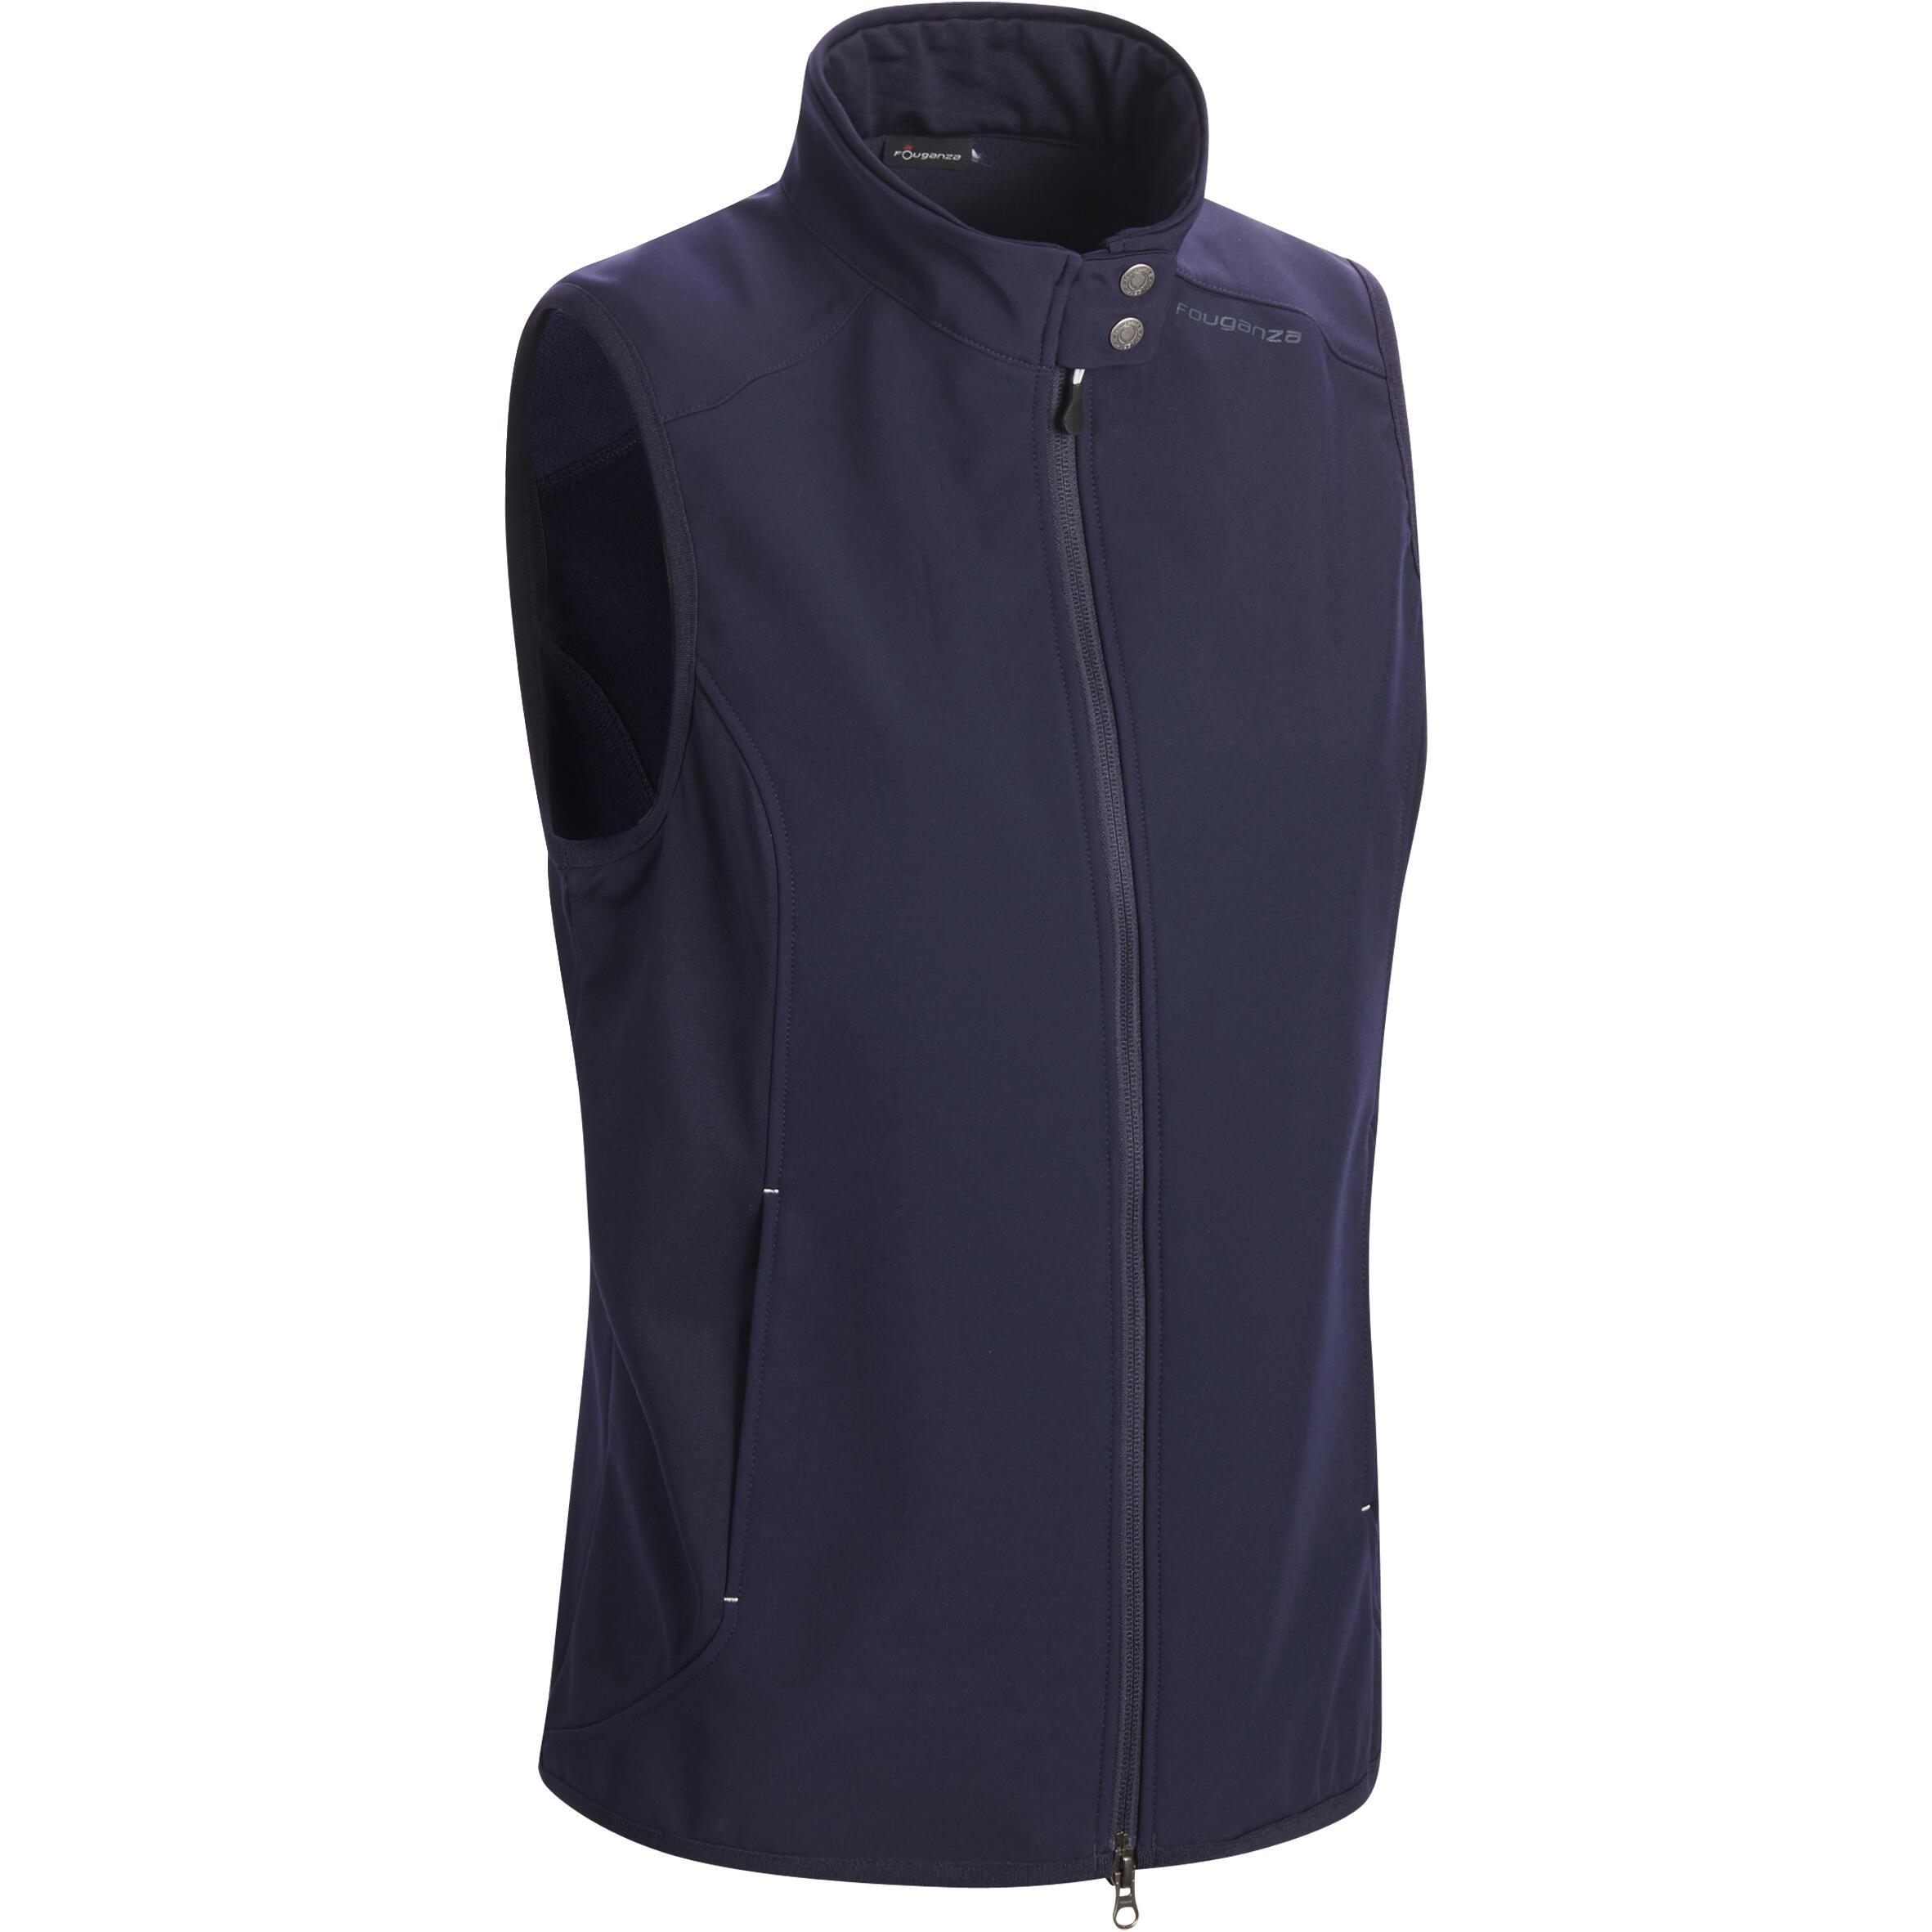 Reitweste 500 Damen marineblau | Sportbekleidung > Sportwesten > Funktionswesten | Blau | Fouganza